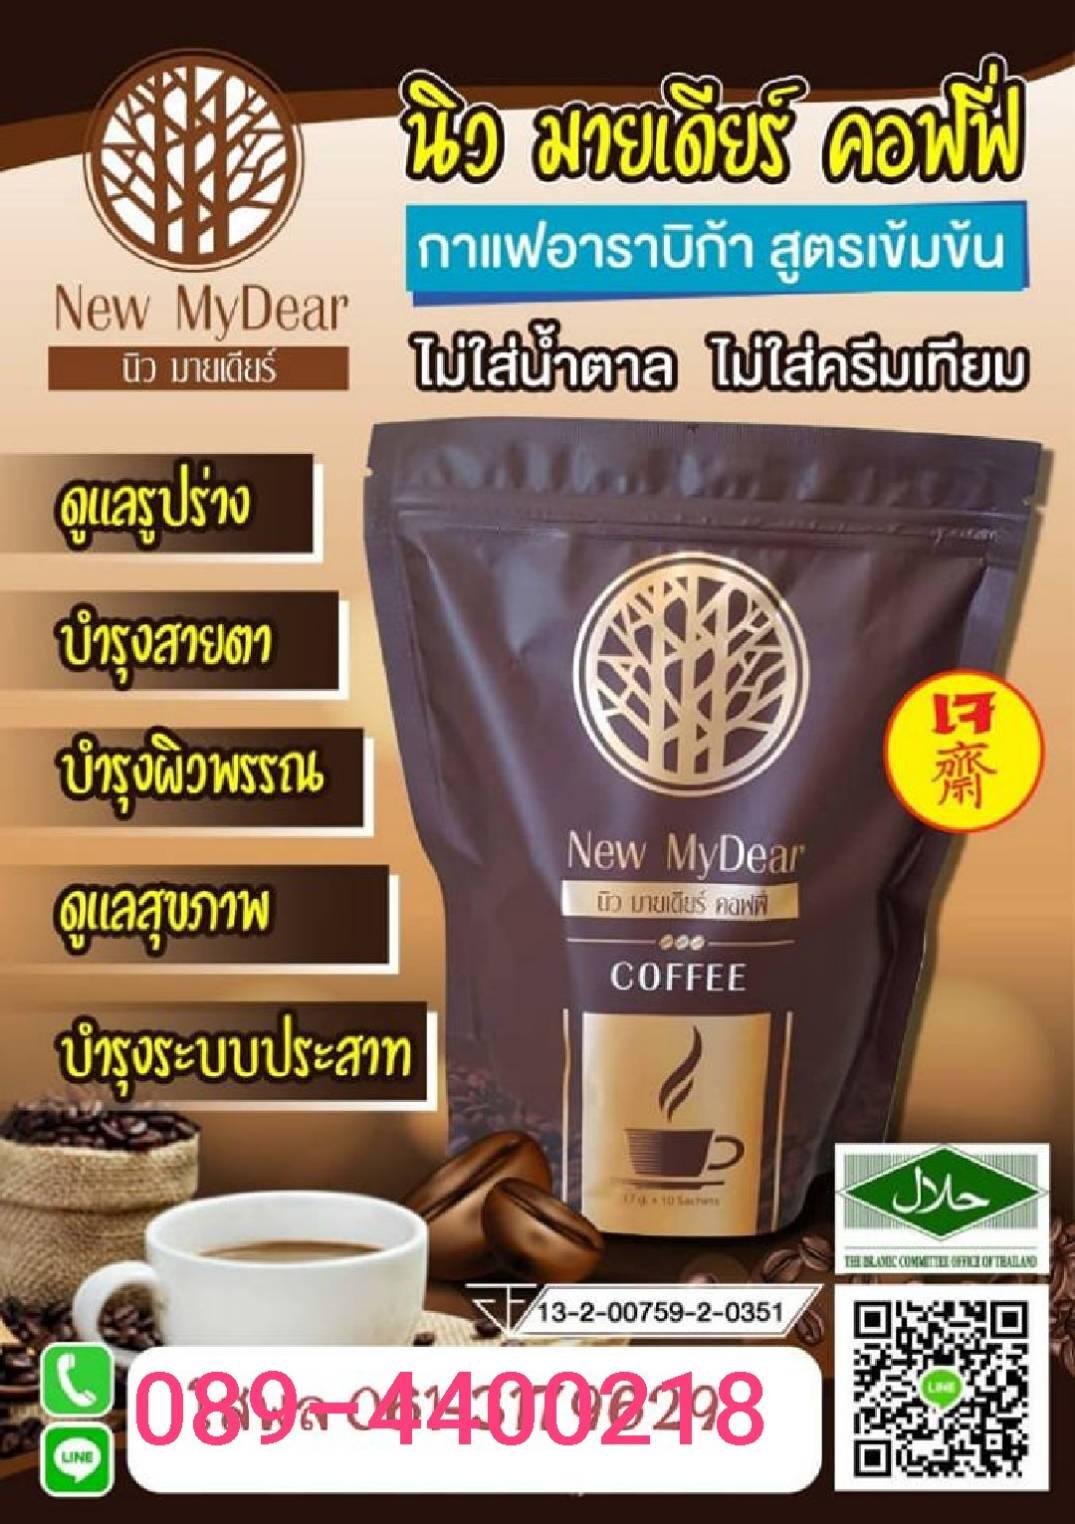 SME 360 SHOP Drop Off Songkhla